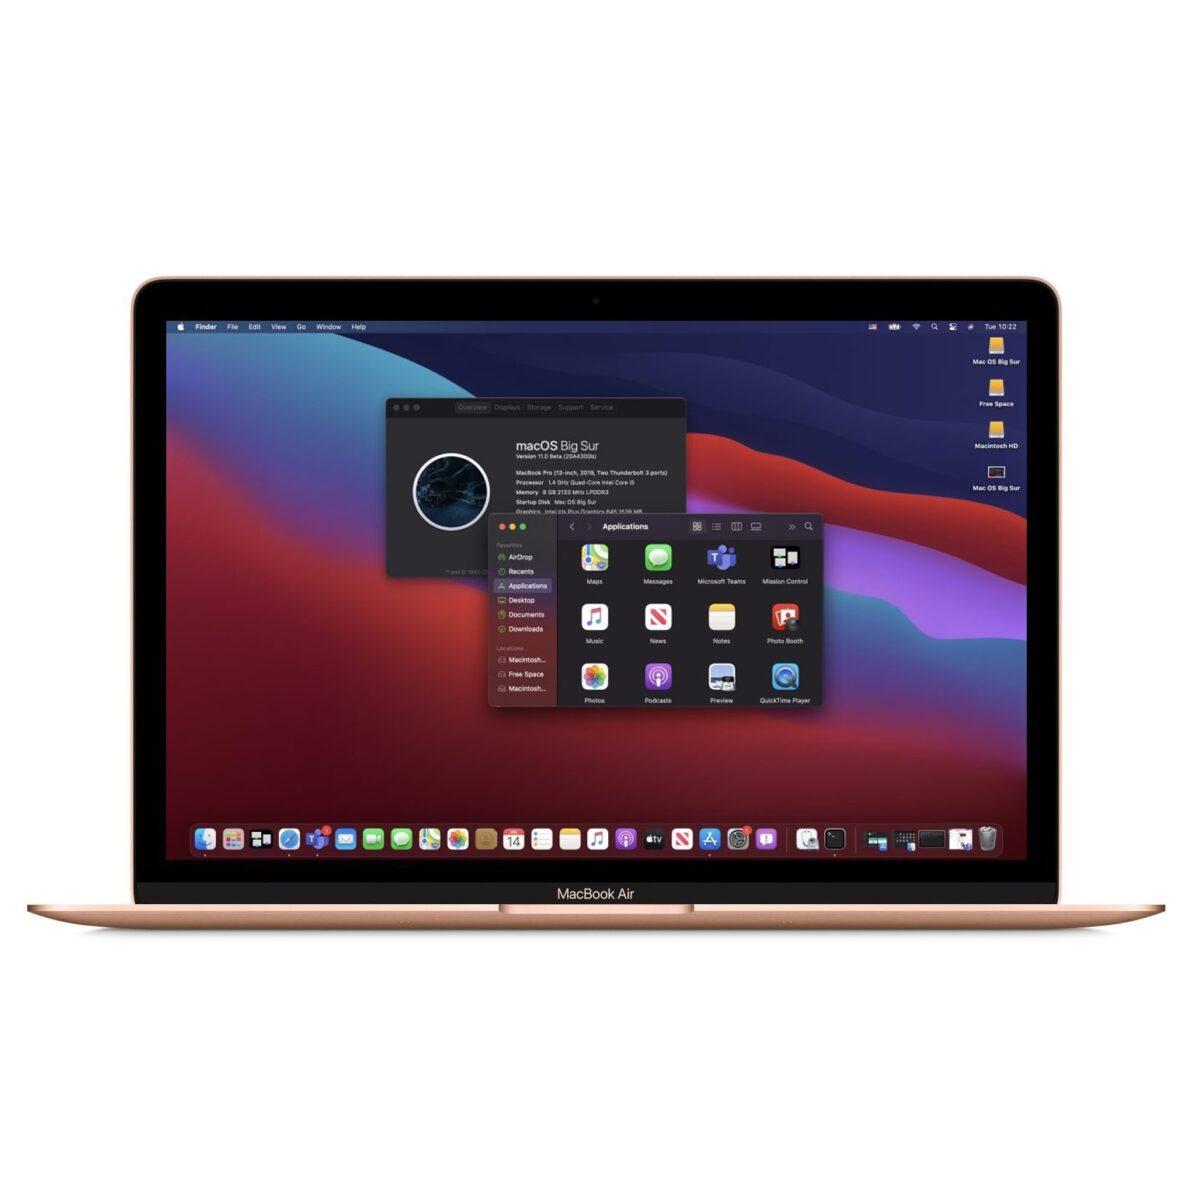 "Apple Macbook Air OS Big Sur 512GB SSD 16GB RAM Powerful 13.3"" Mac Laptop Core i5 2018 Gold"